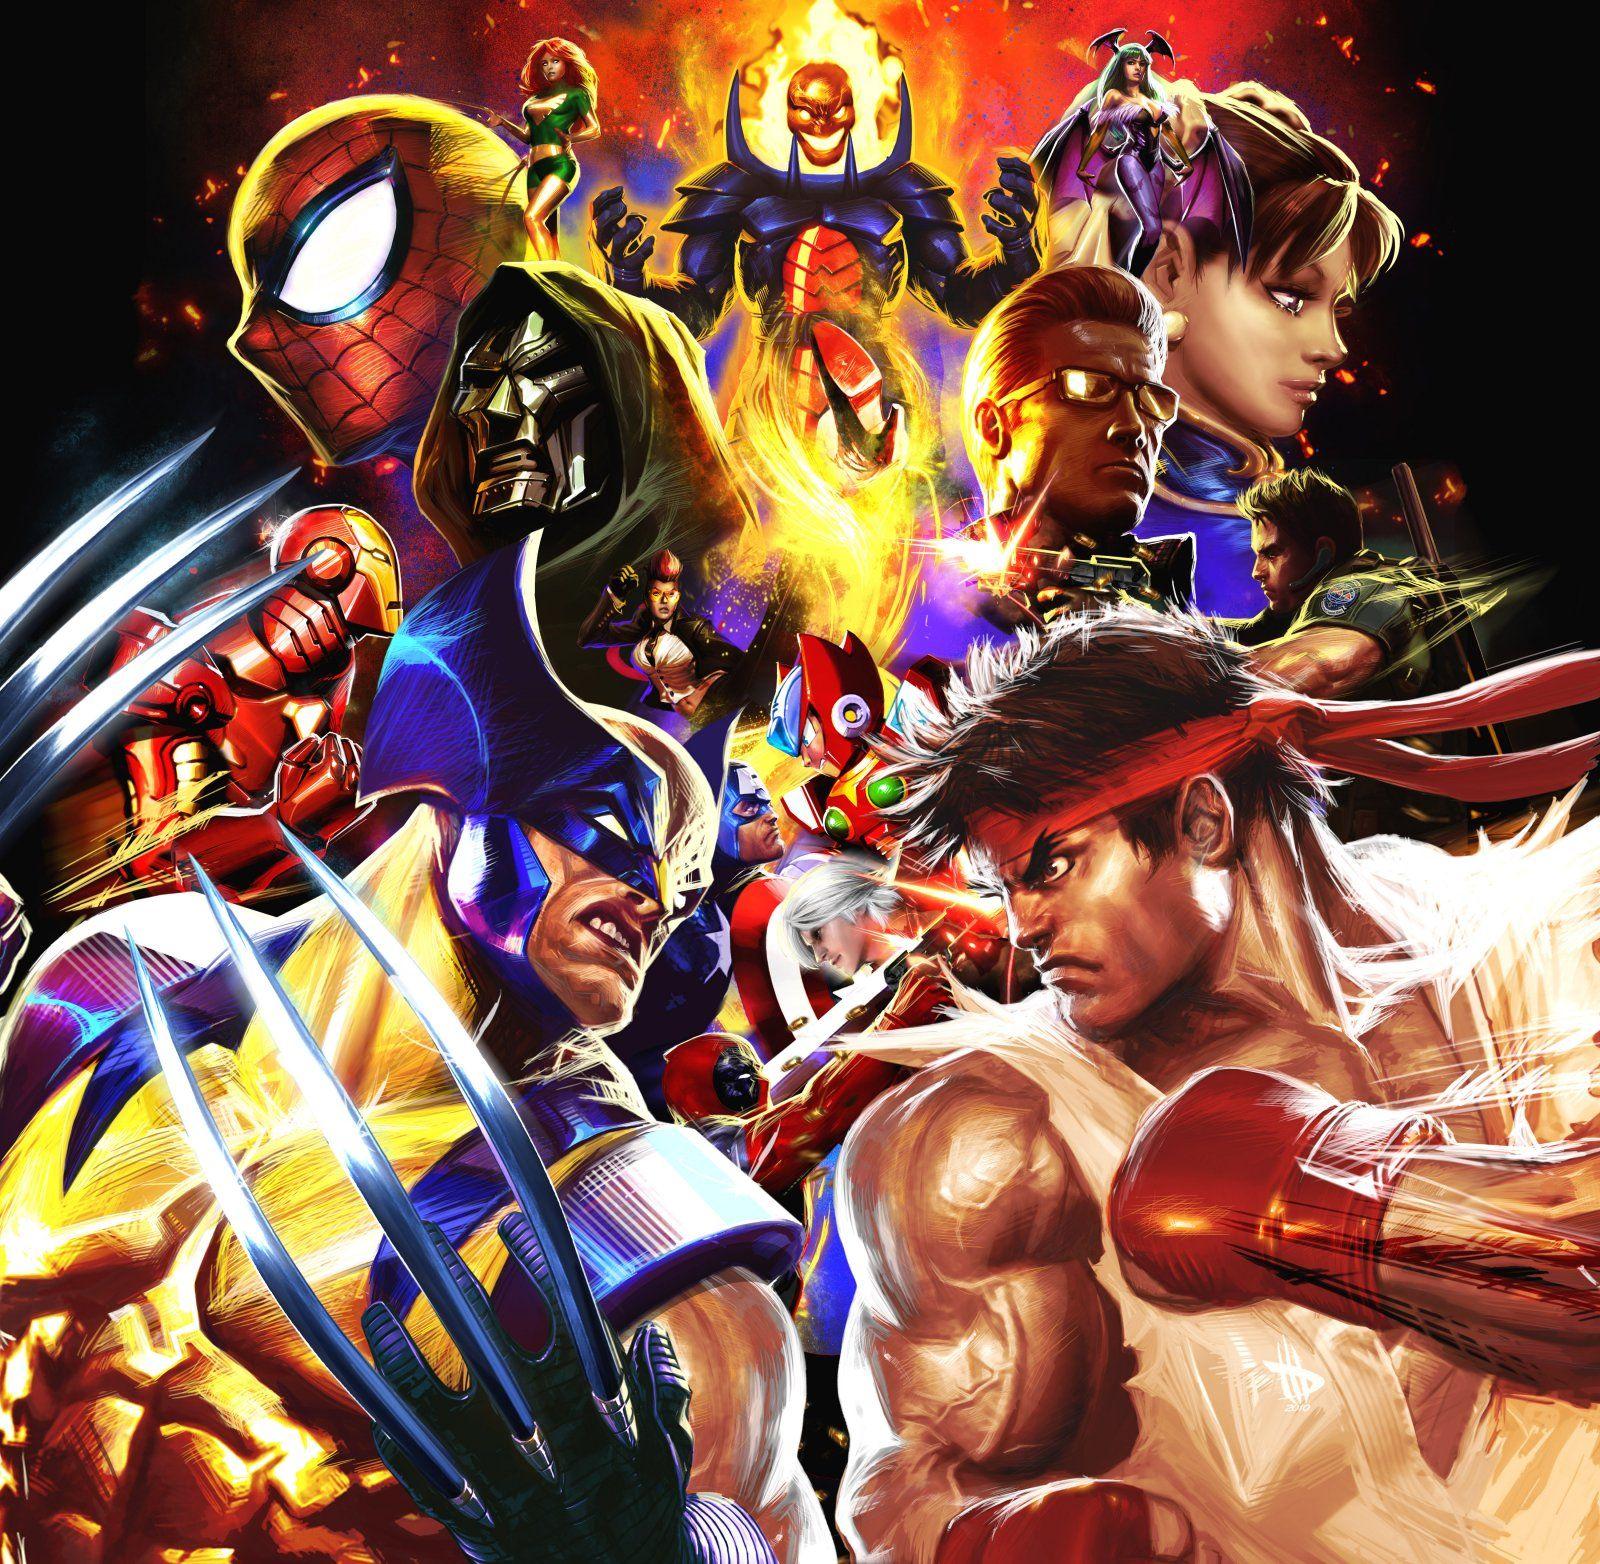 Marvel Vs Capcom 3 Fan Art Looks Like An Epic Movie Poster News Gametyrant Marvel Vs Capcom Marvel Vs Marvel